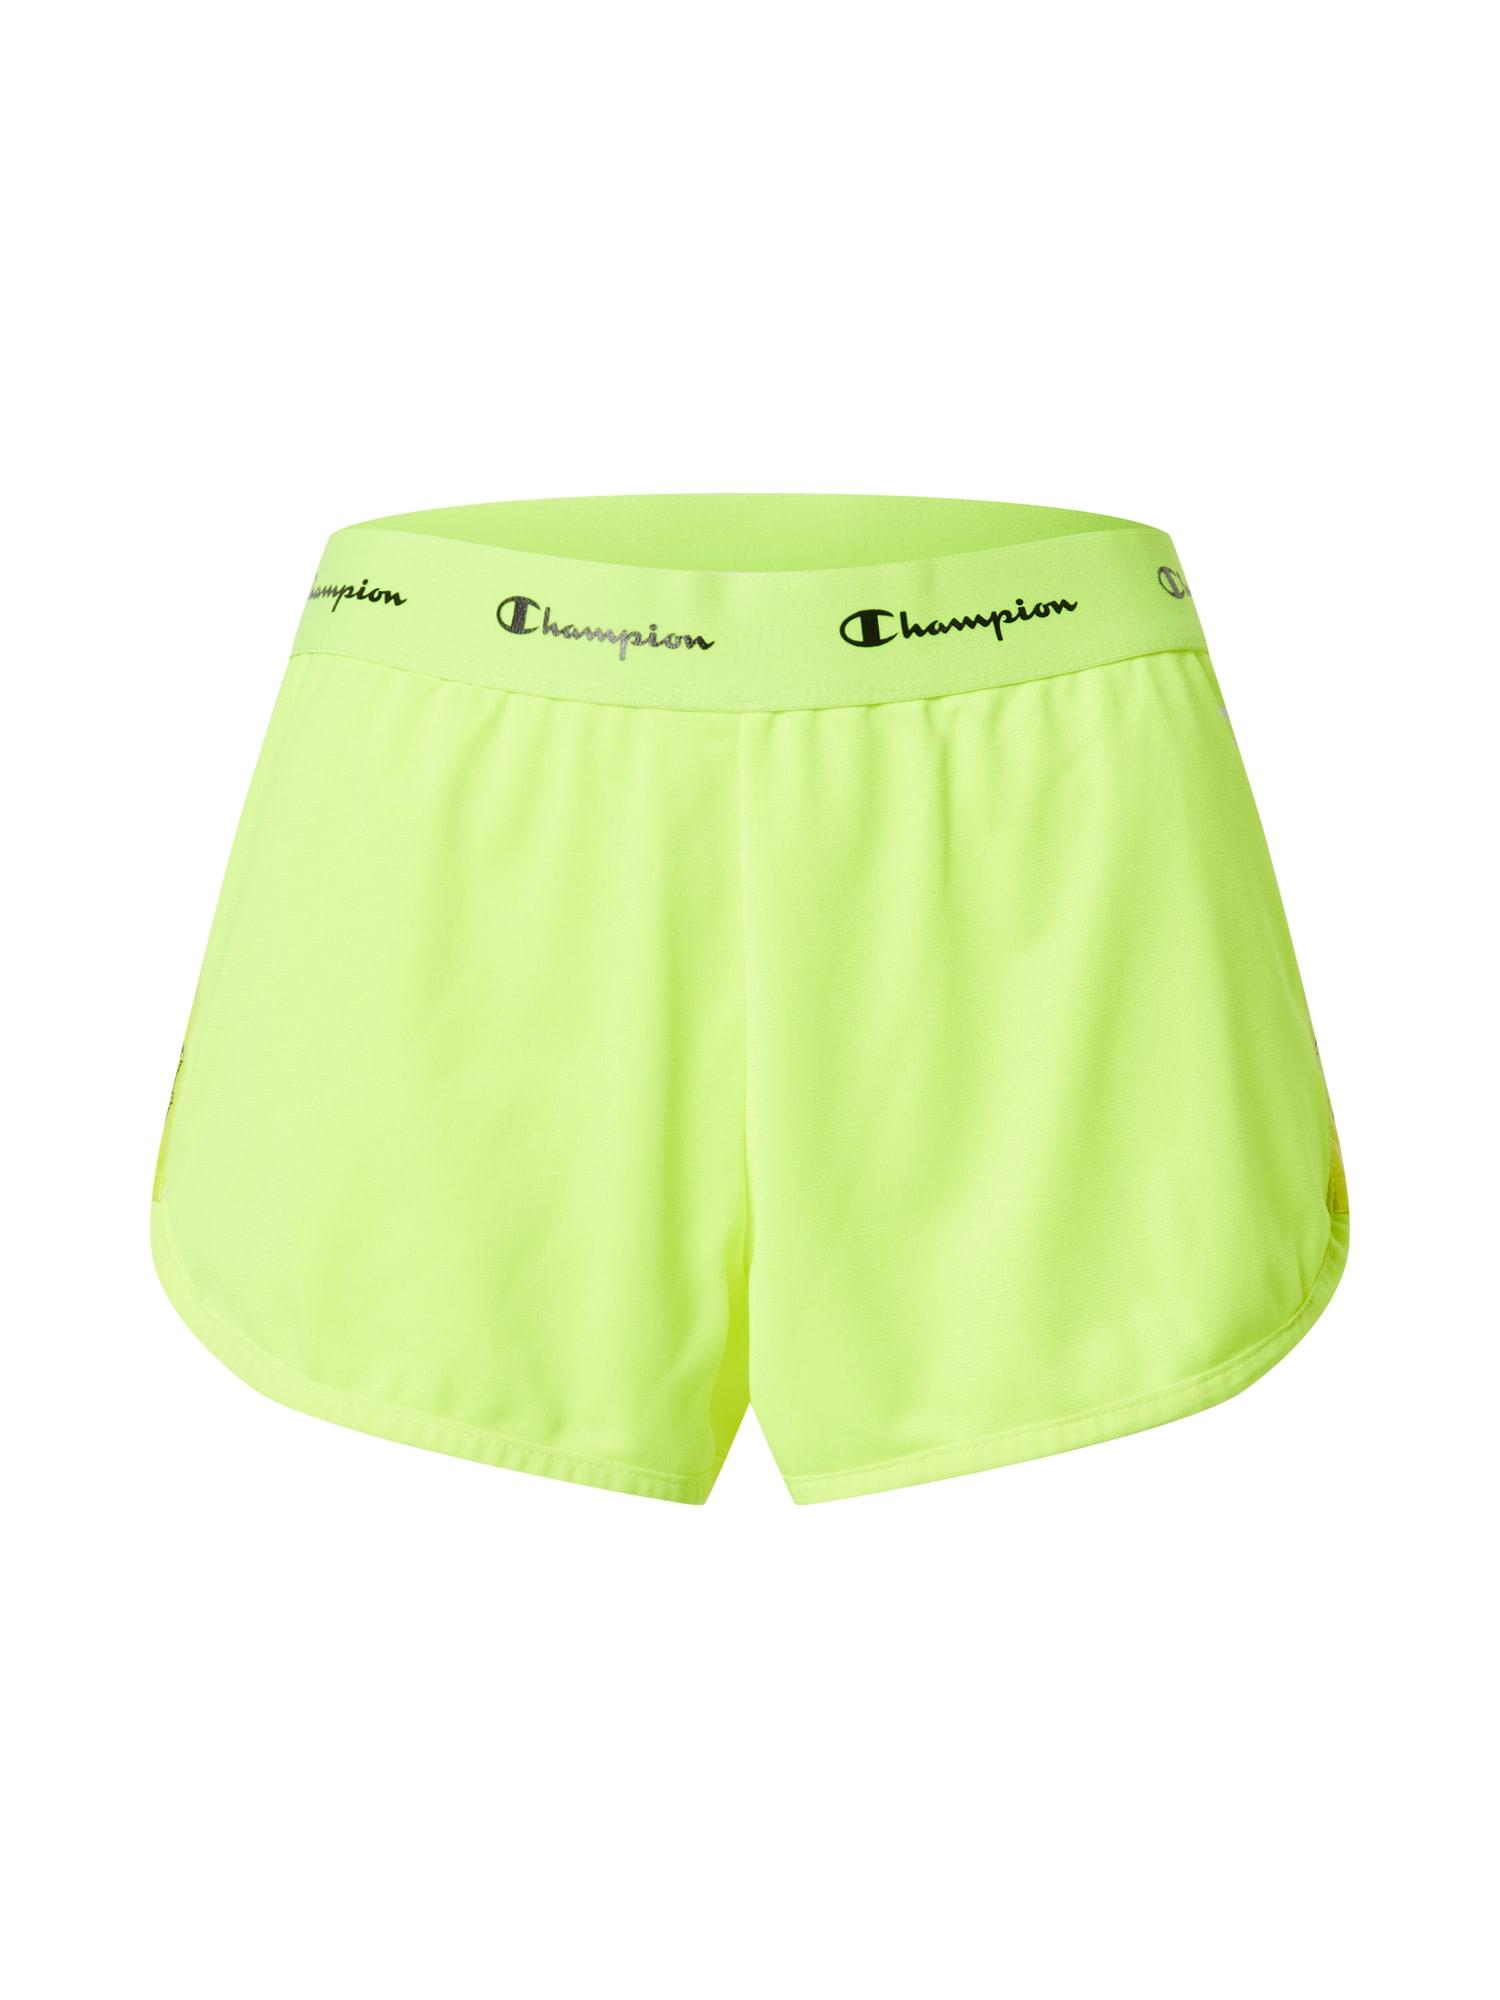 Champion Authentic Athletic Apparel Kelnės geltona